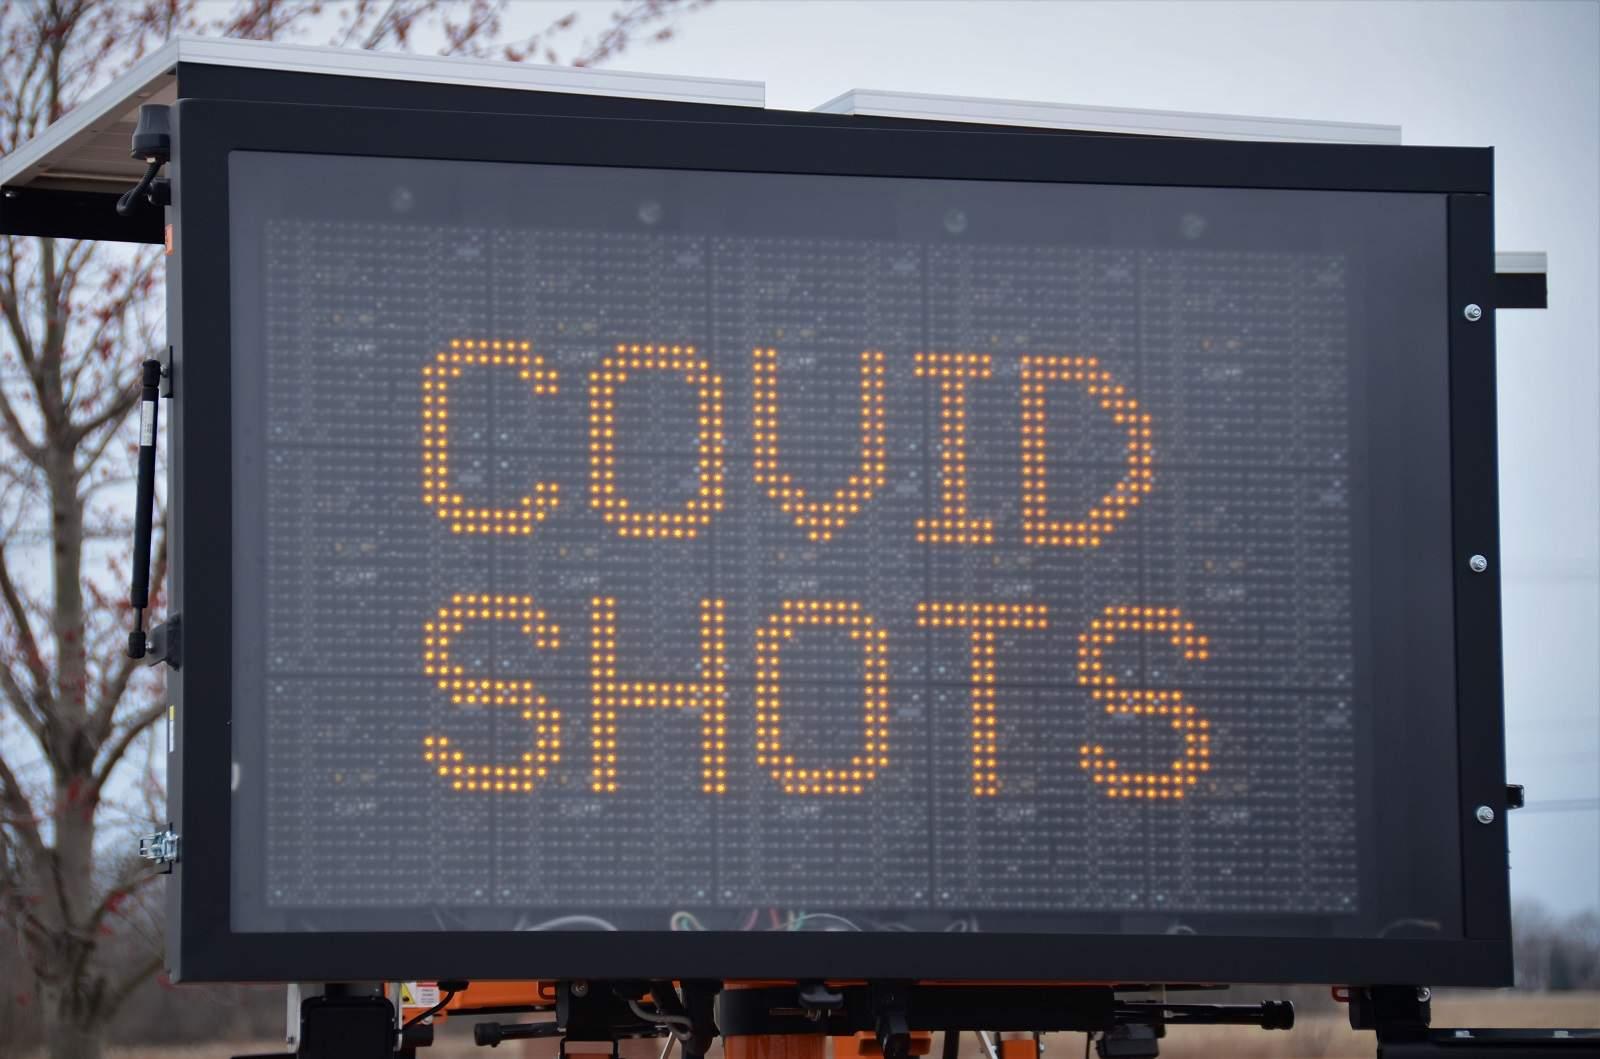 Penyintas Covid-19 Gejala Ringan Nggak Harus Nunggu 3 Bulan untuk Vaksin, Sekarang Sebulan Cukup